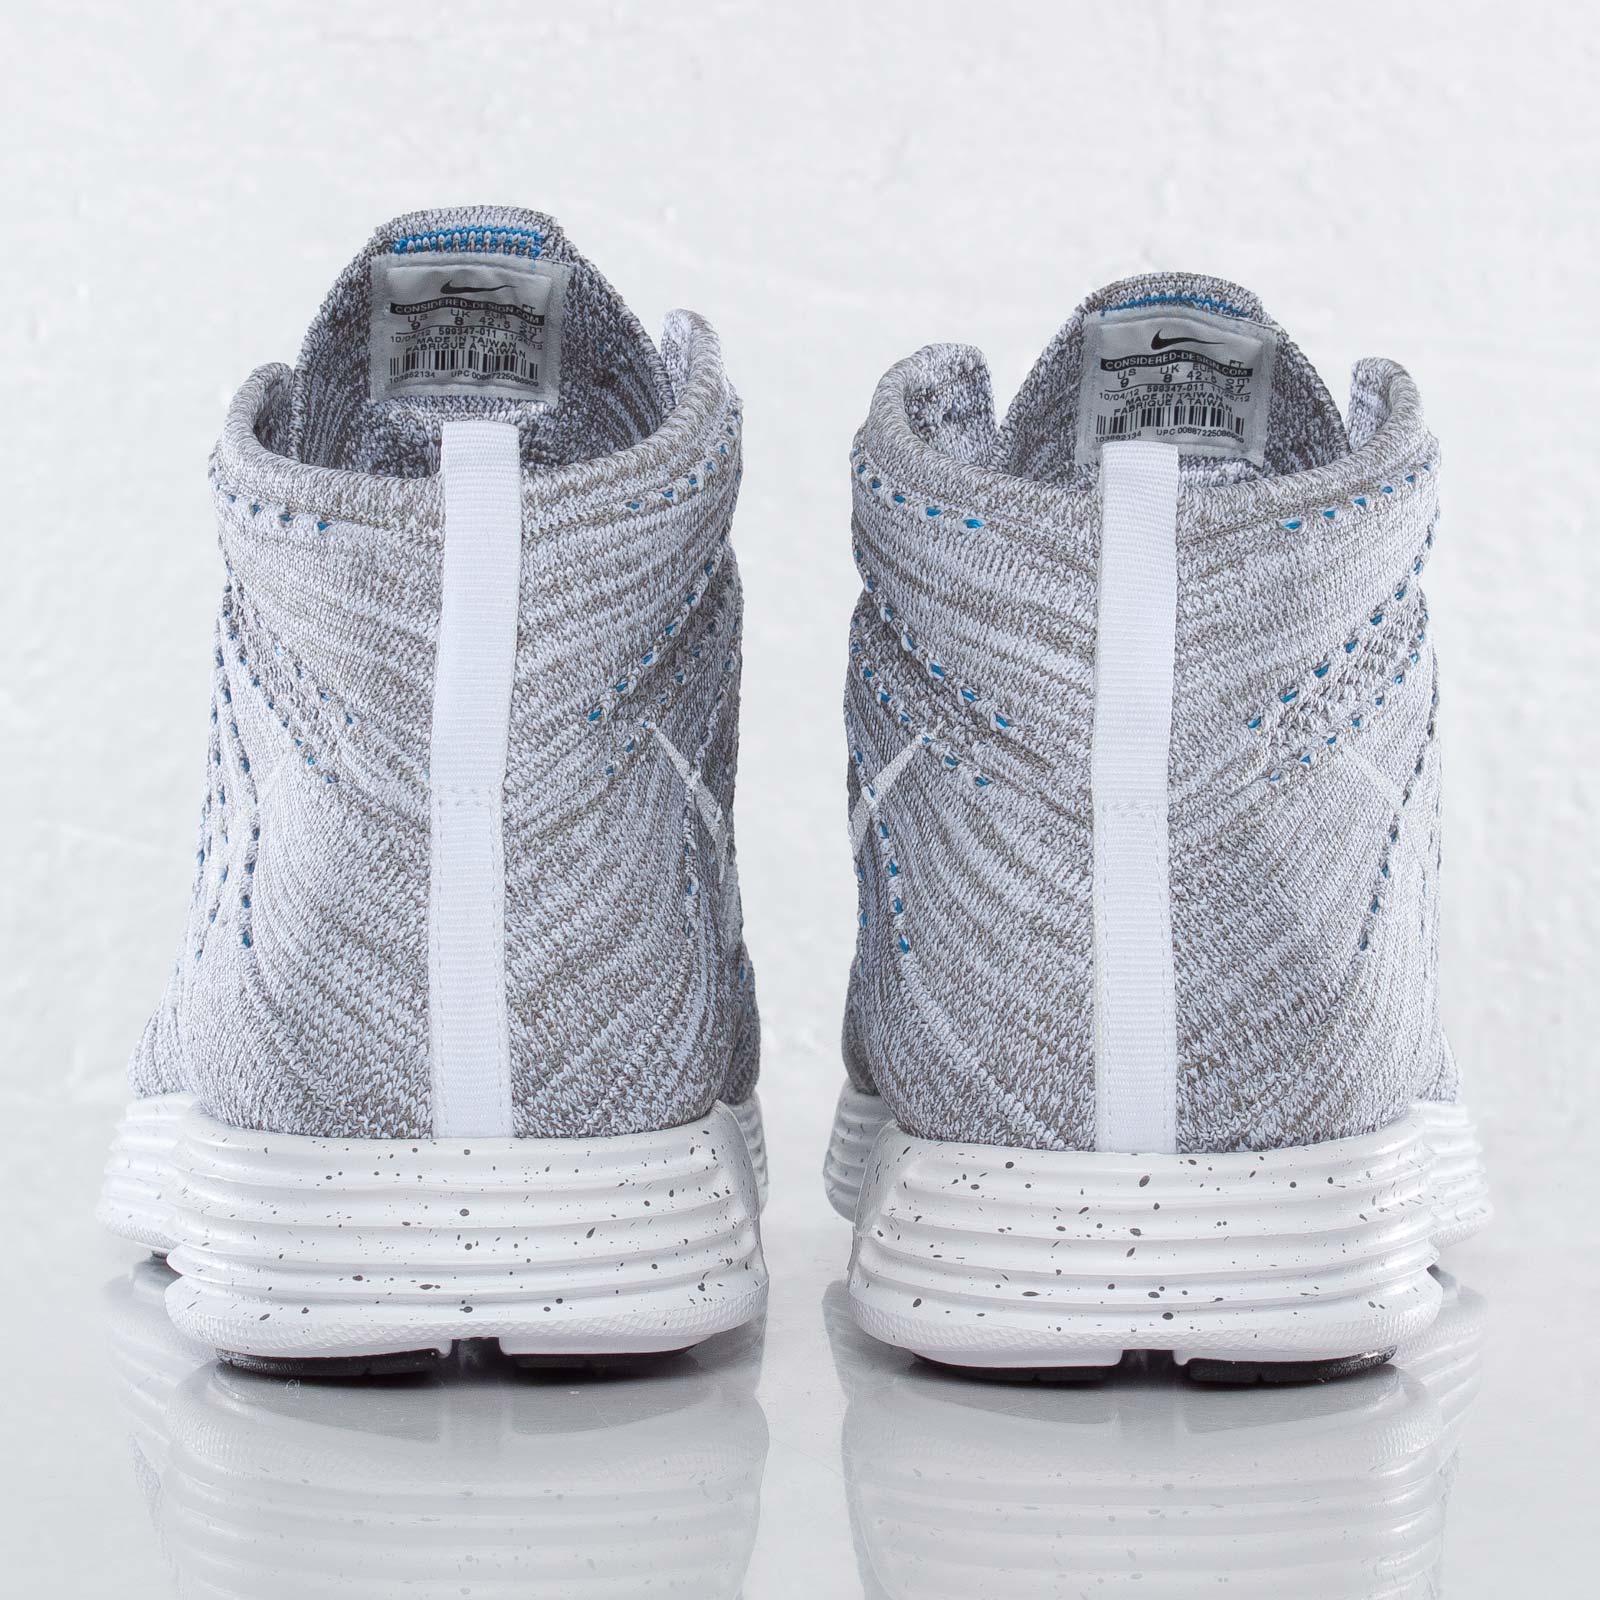 599347 Chukka Htm Sneakersnstuff Nike 011 Flyknit Lunar Sp TnxZX